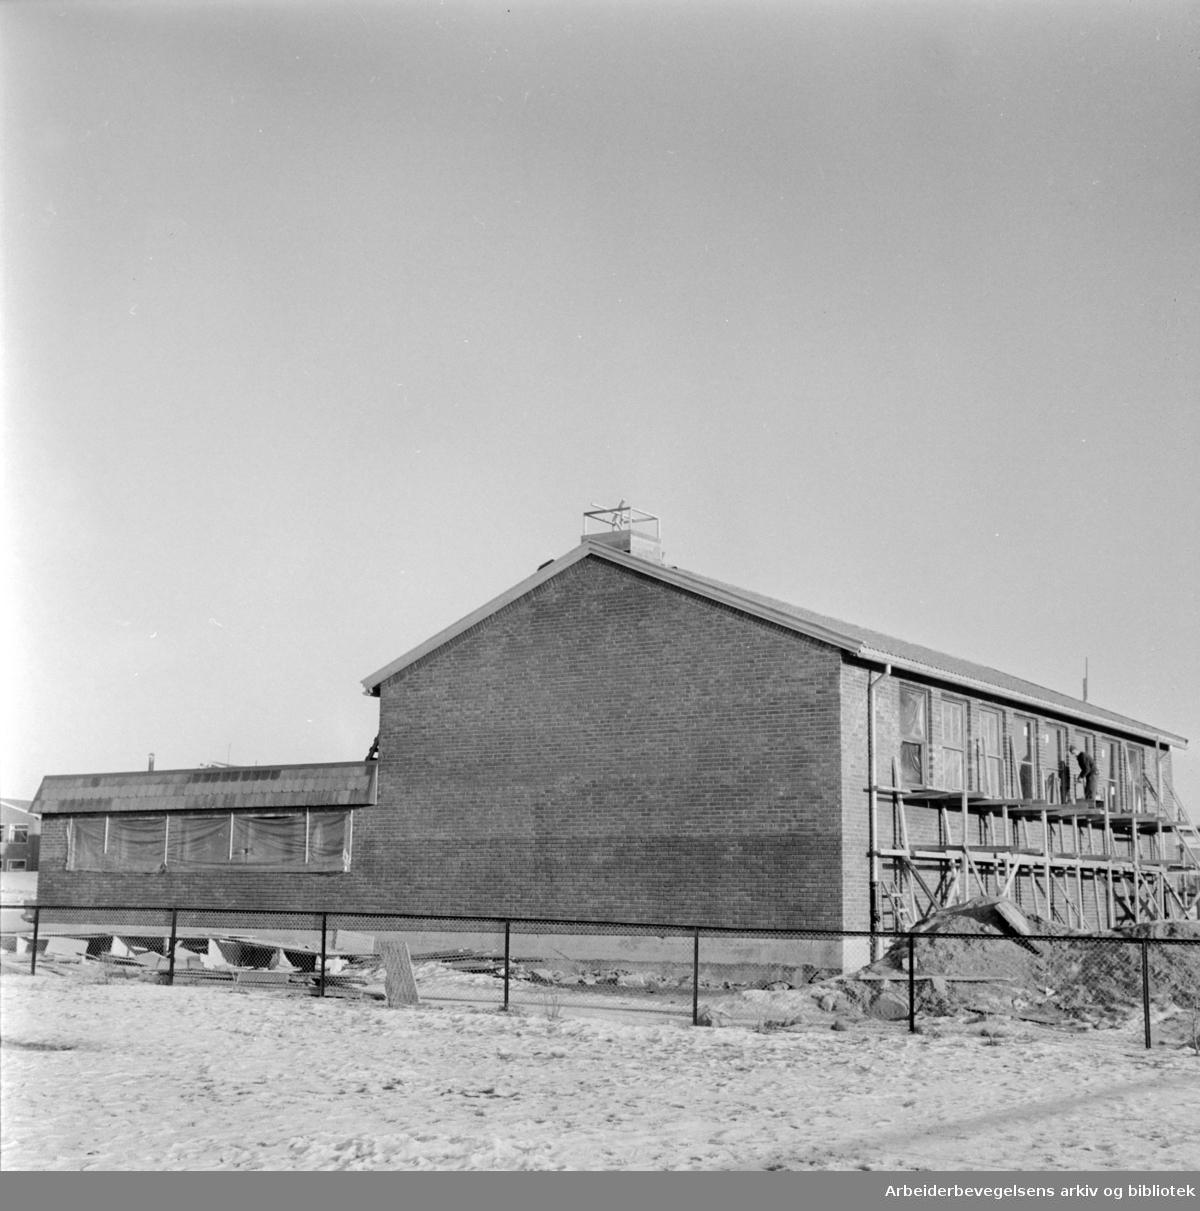 Nordstrand: Nordtvet skole. Ny gymnastkksal. Februar 1964